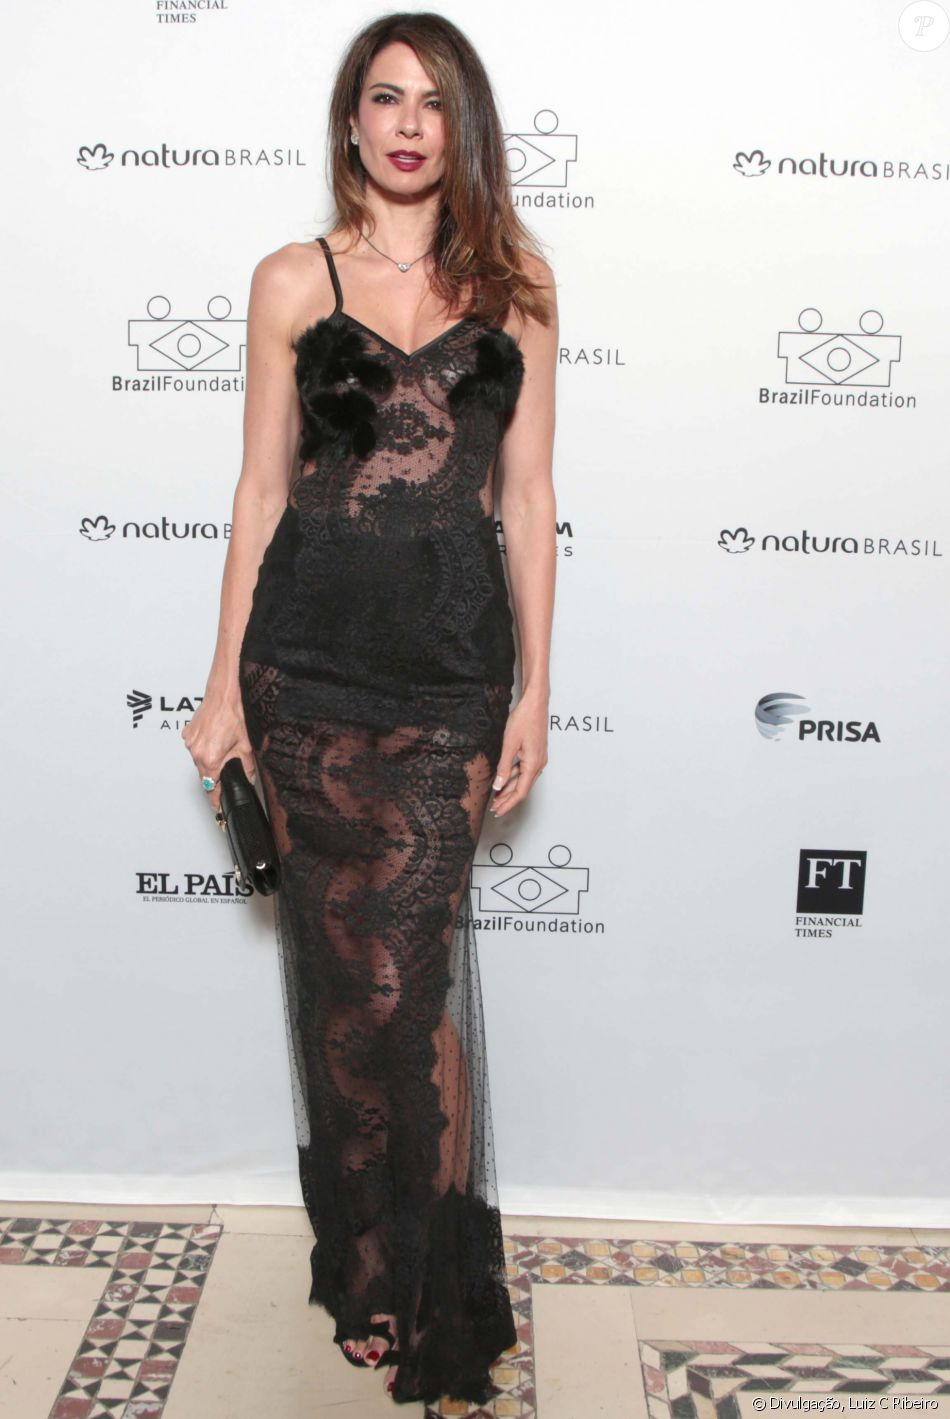 9826acbd8 A apresentadora Luciana Gimenez usou vestido Vitor Zerbinato e sapato e  bolsa Carmen Steffens